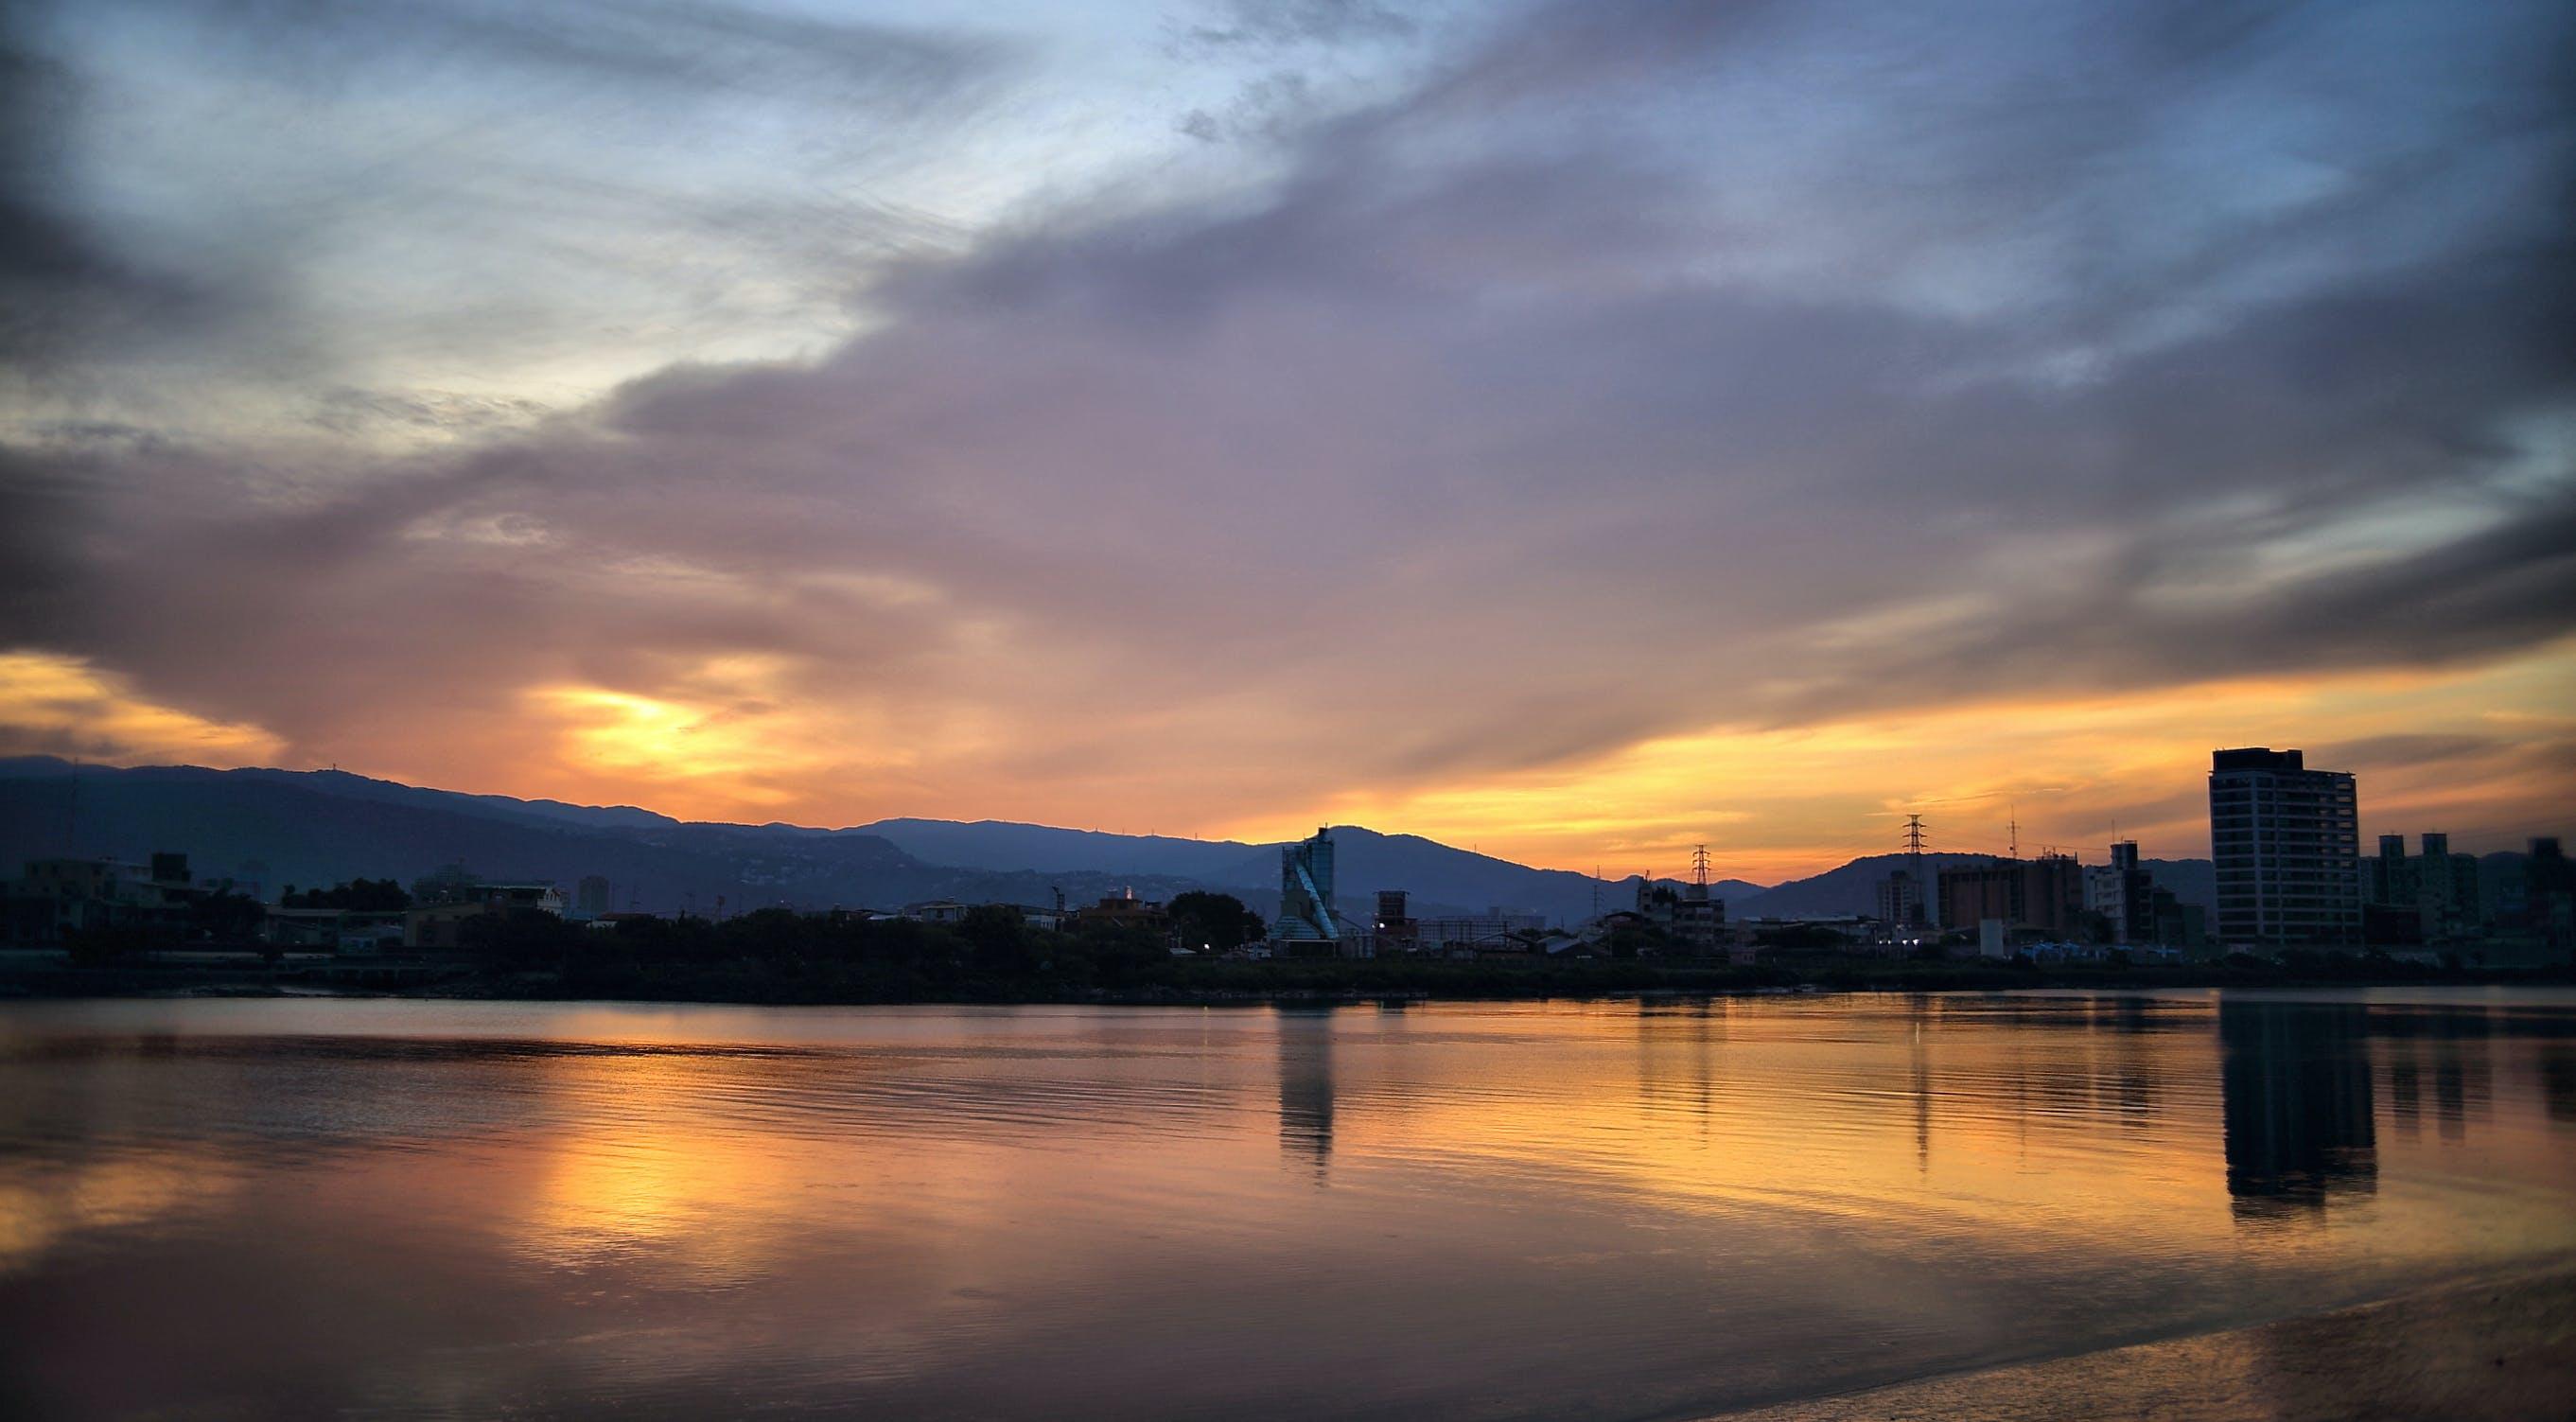 Water Near City Under Grey Cloudy Sky Landscape Photography